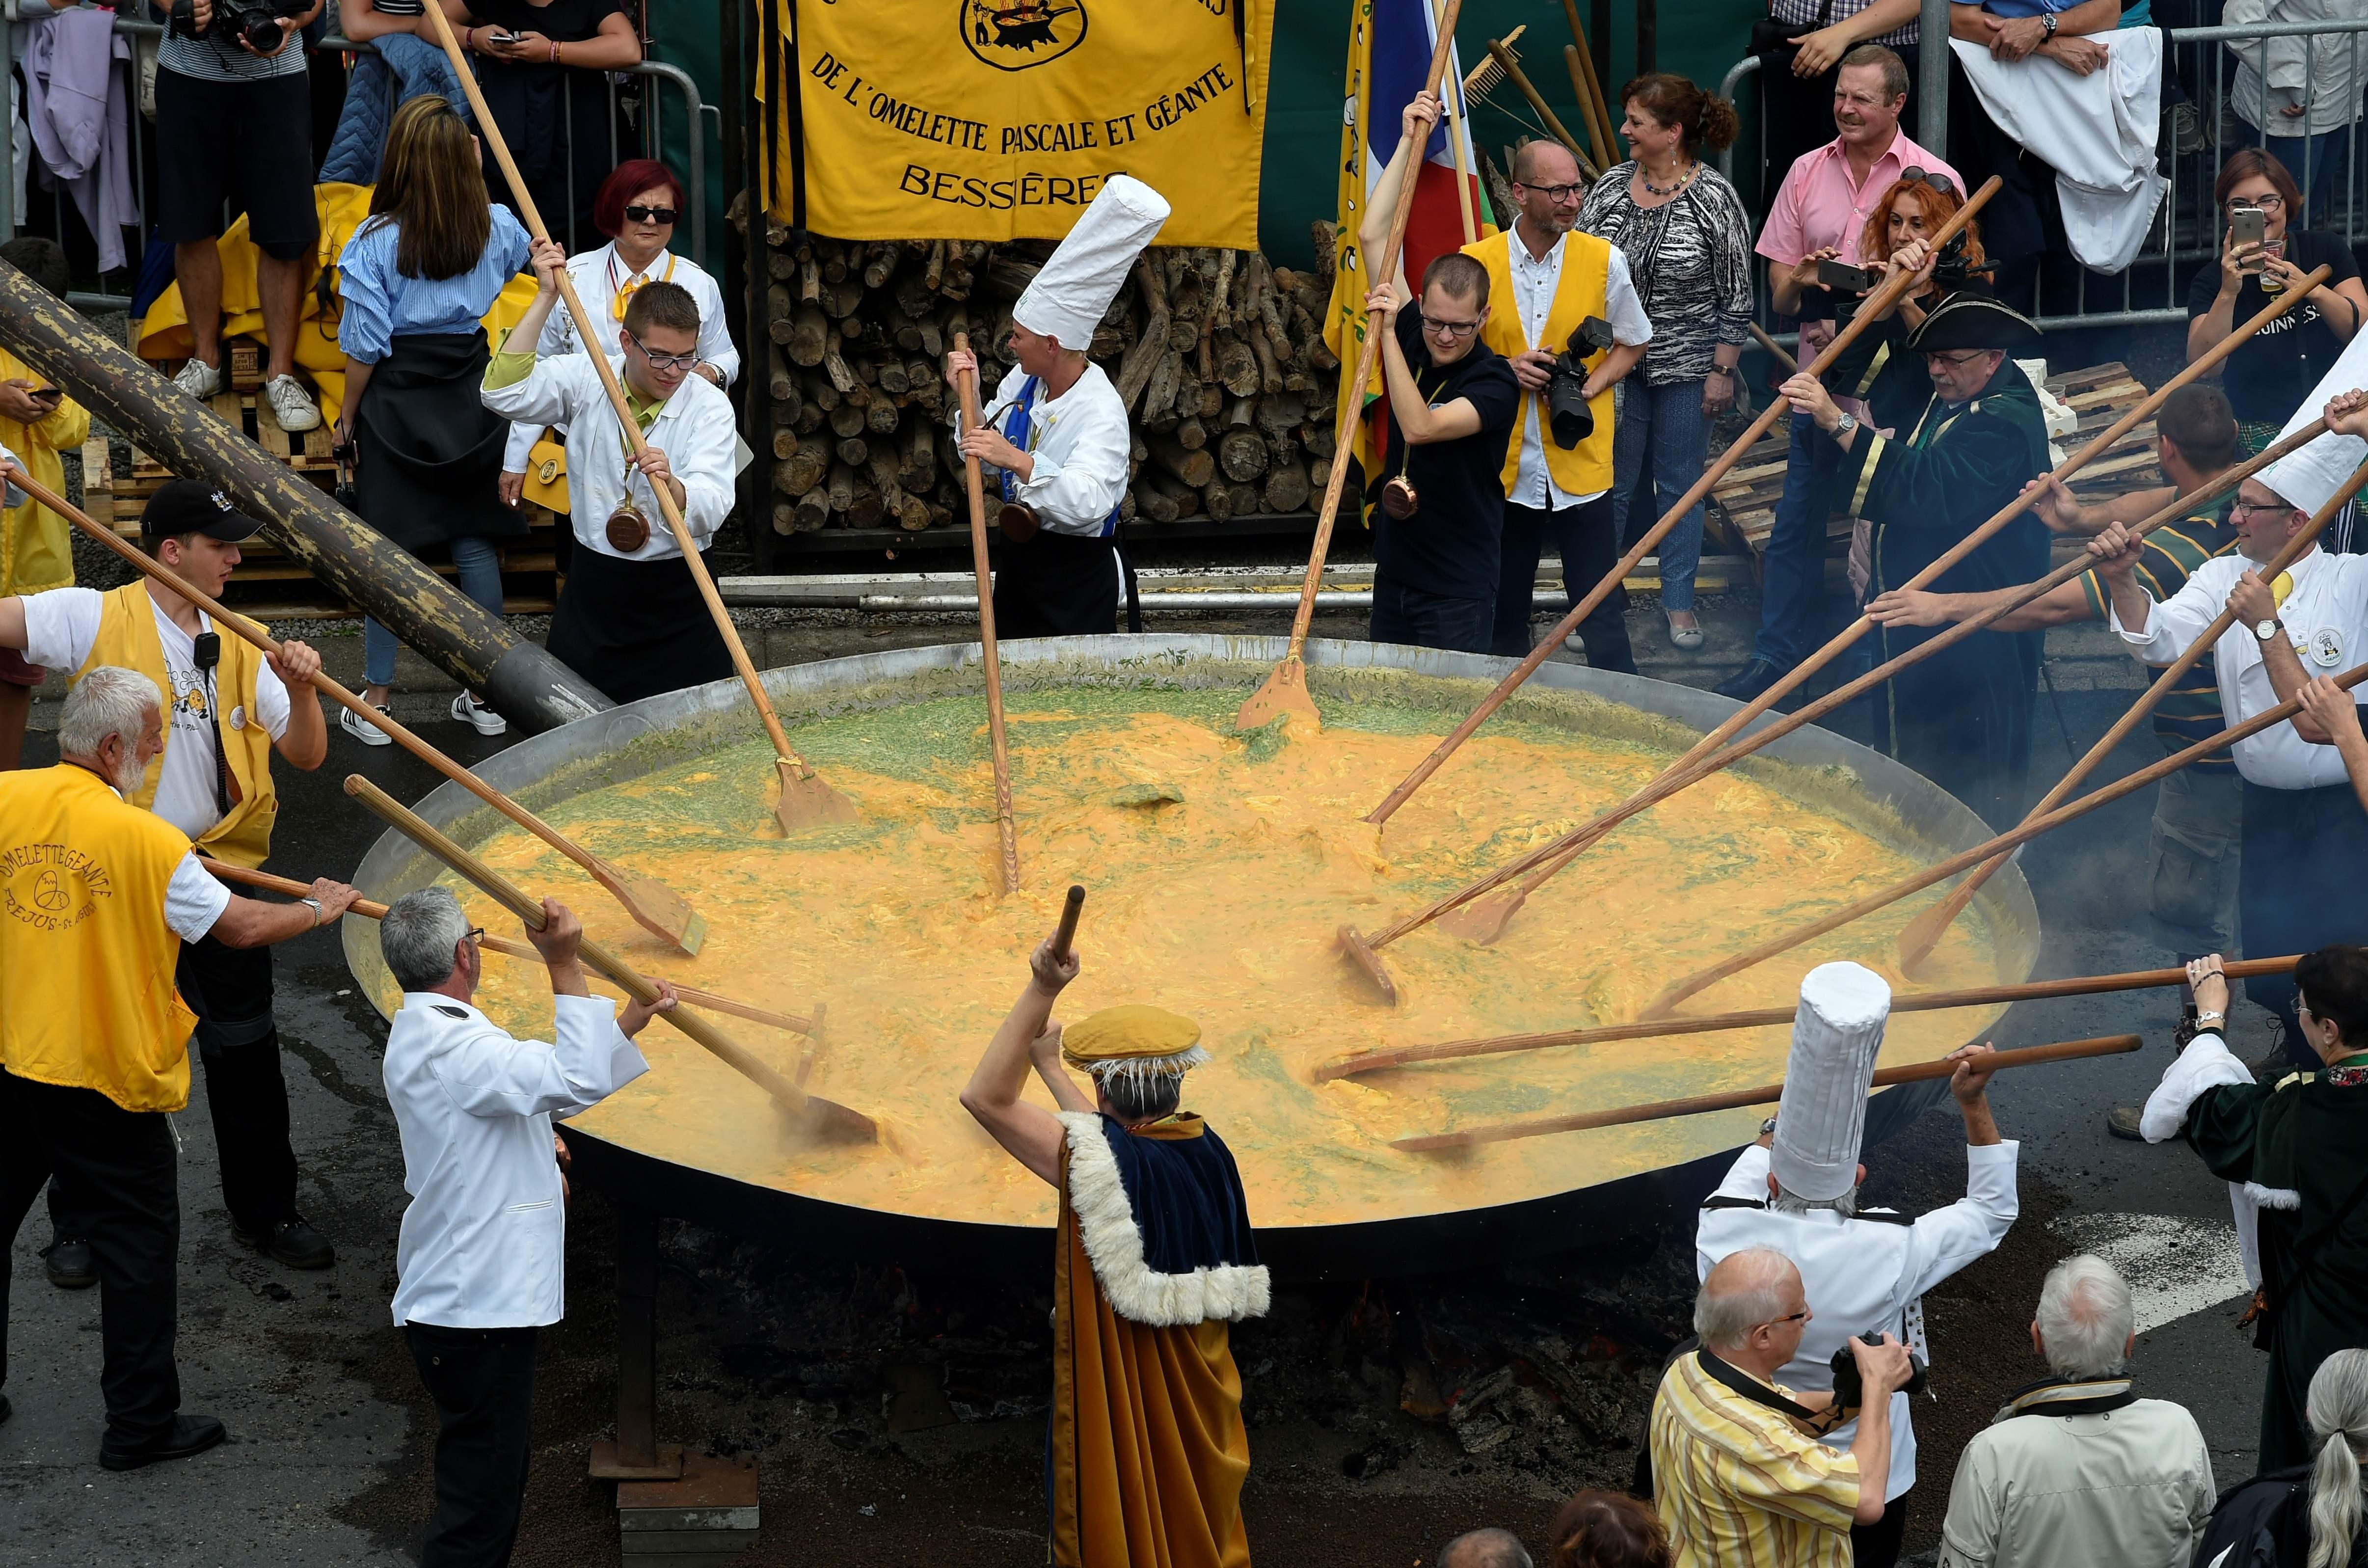 Video: Así se prepara un omelet gigante con casi 10 mil huevos